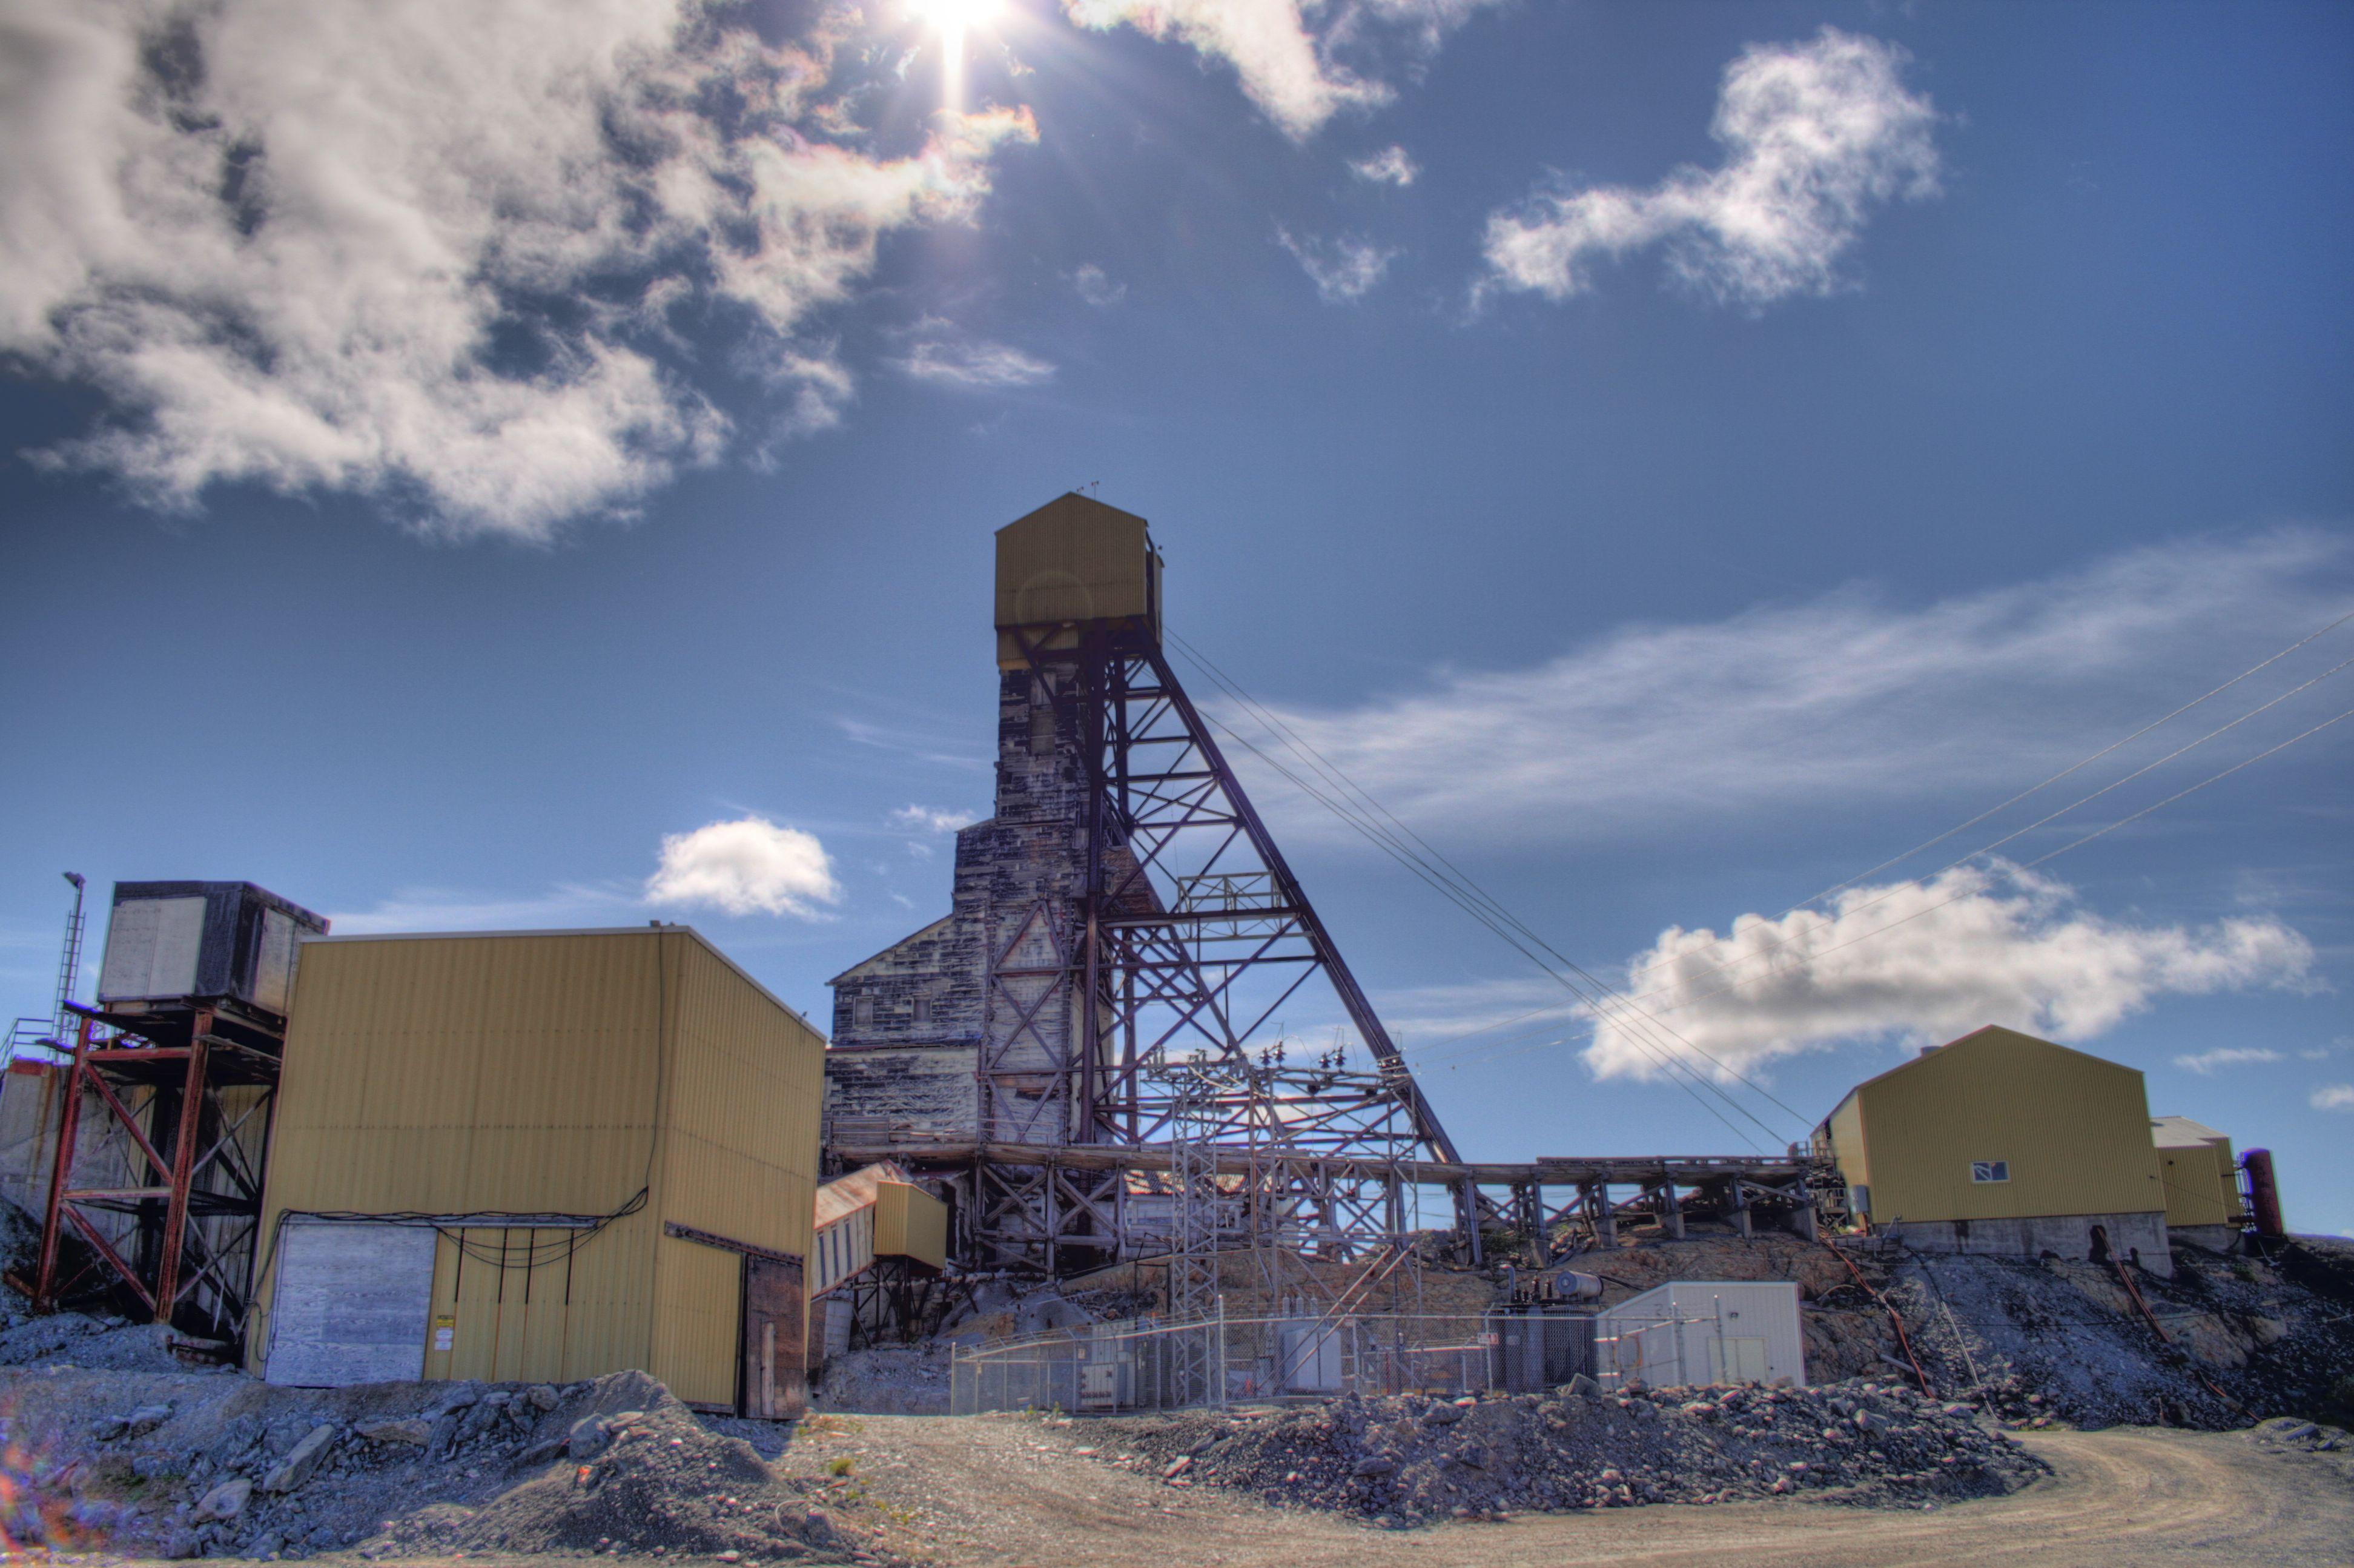 Mine_Building_Giant_Mine_Yellowknife_Northwest_Territories_Canada_12